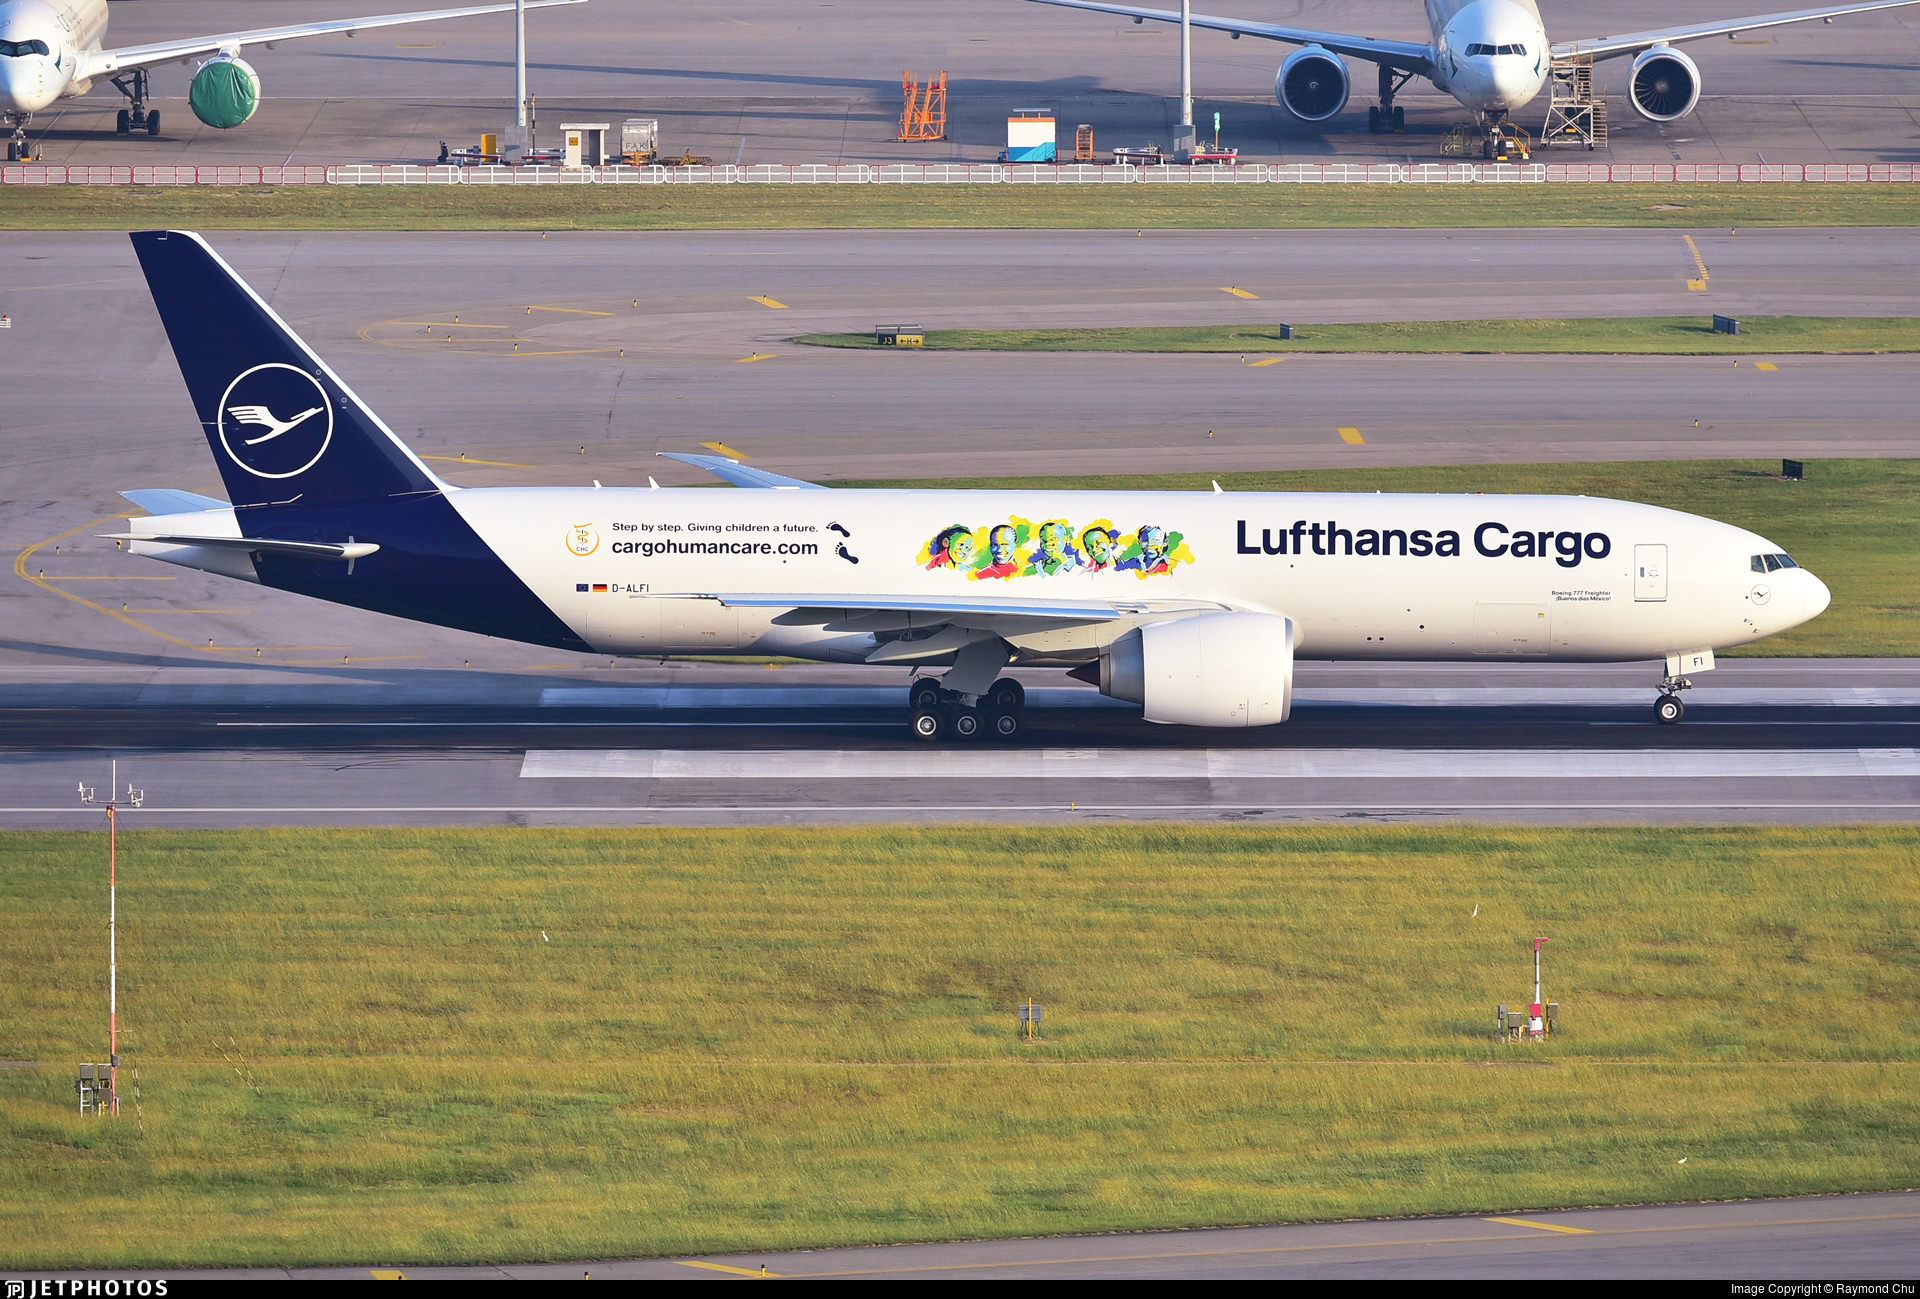 Lufthansa Cargo Human Care 777